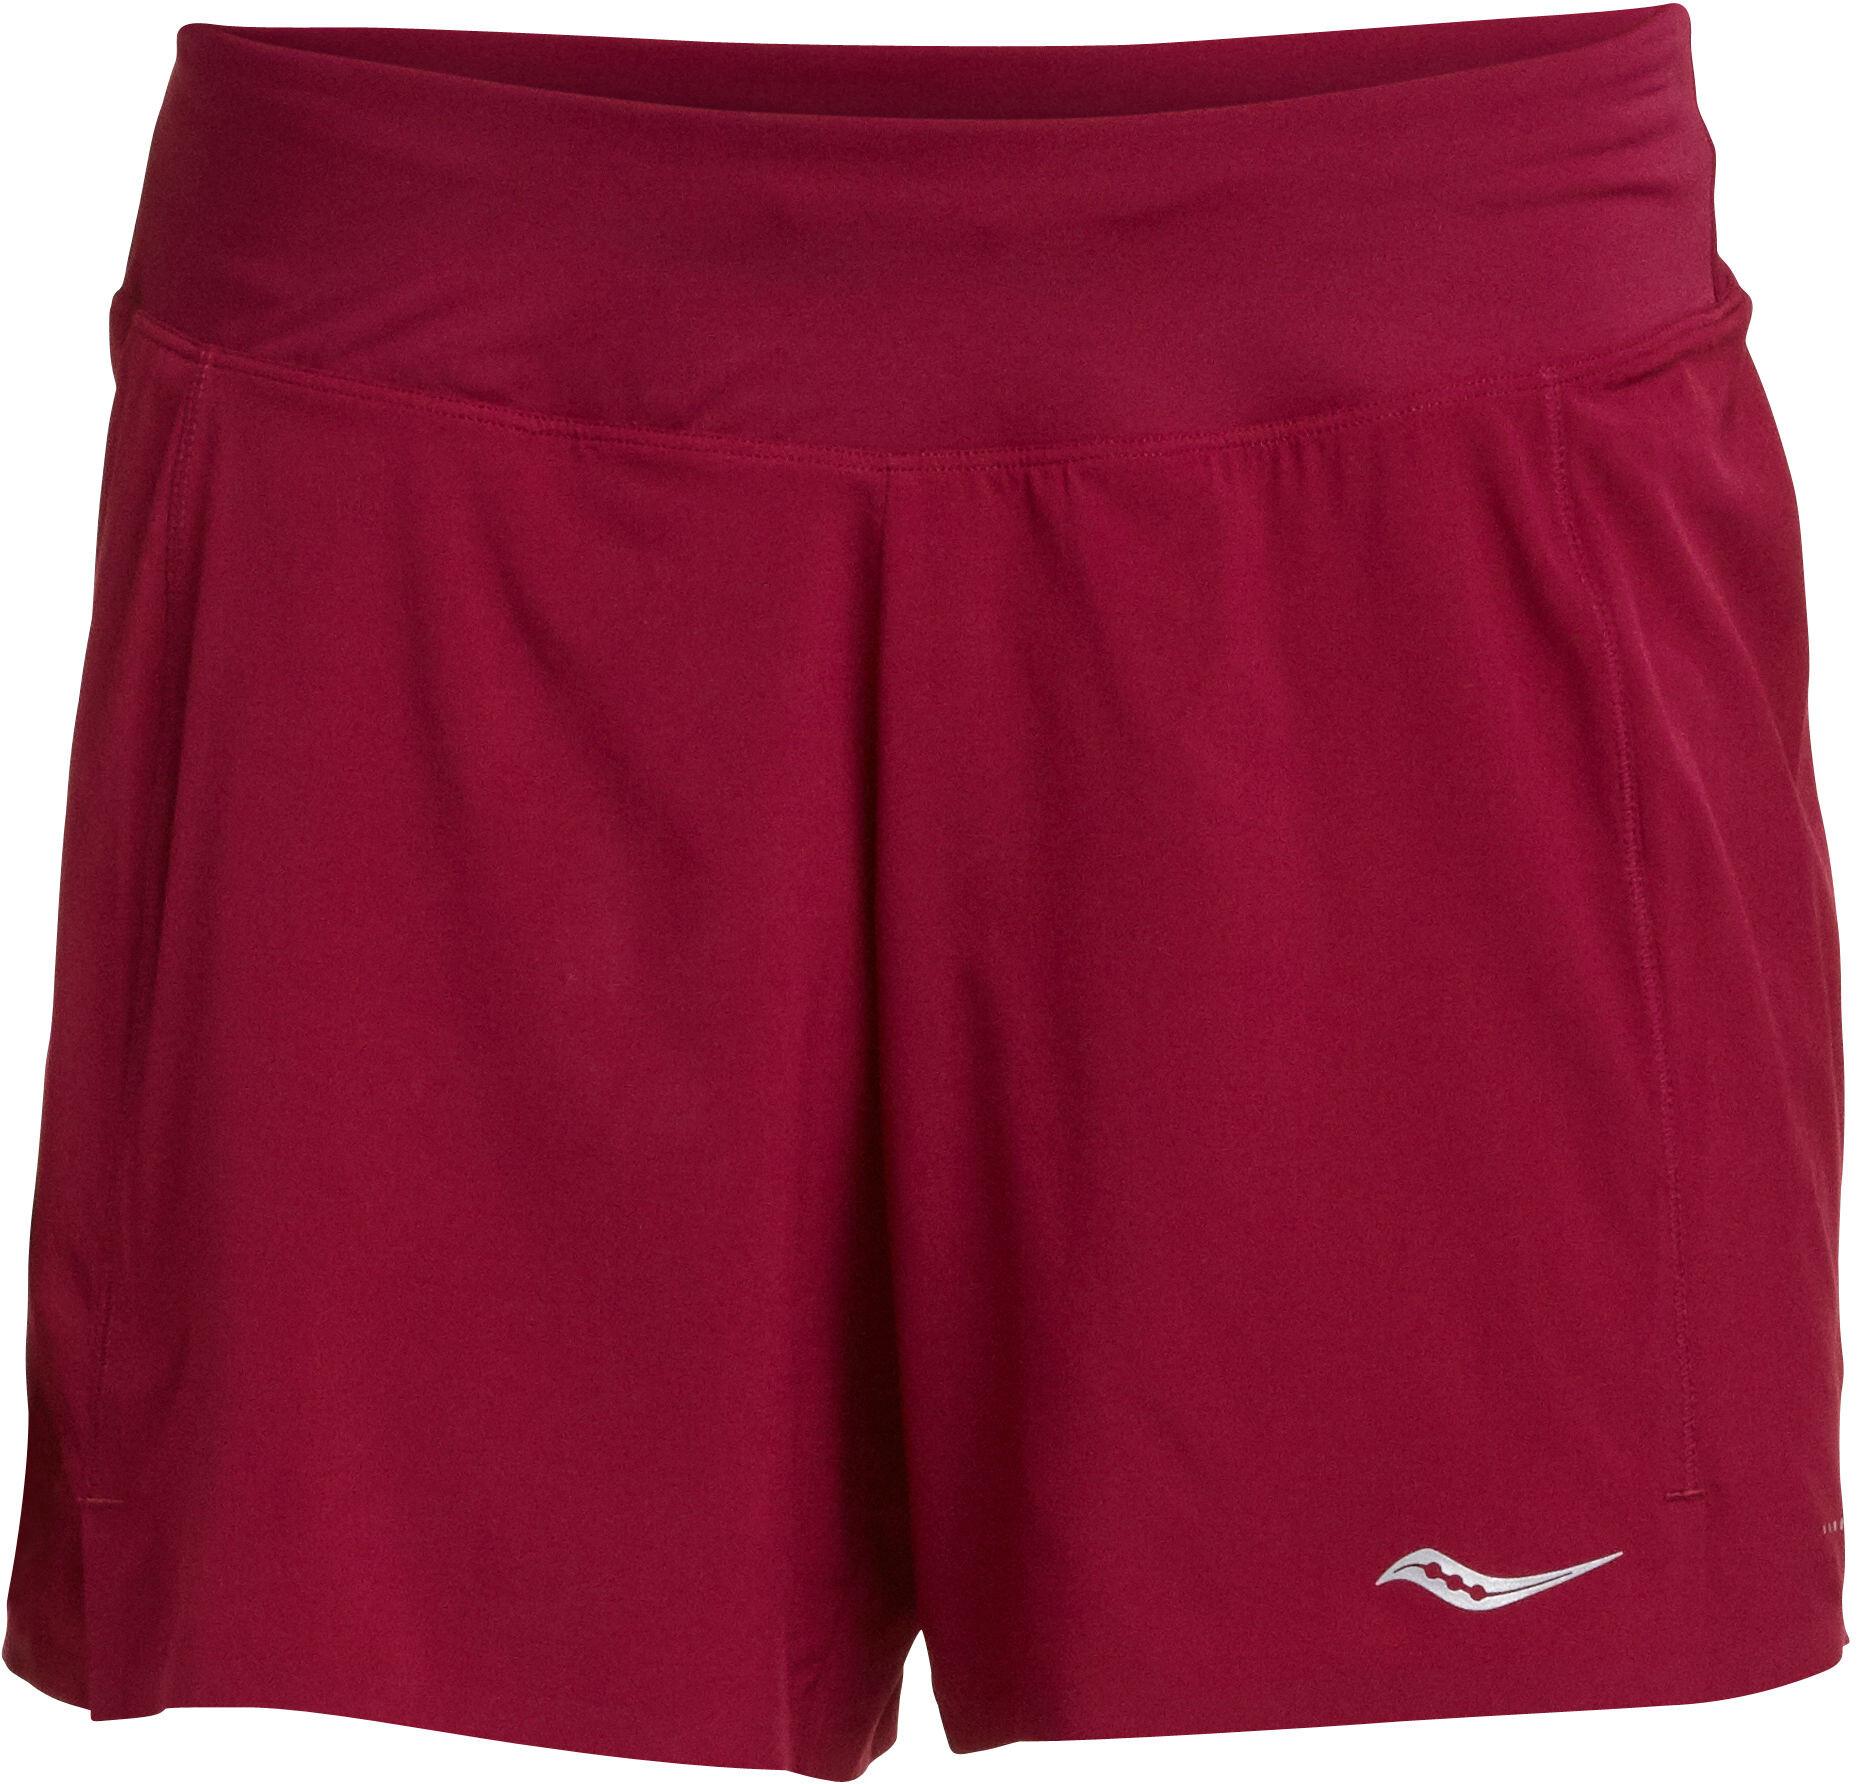 "saucony Tranquil 5"" Shorts Damer, beet red | Bukser"